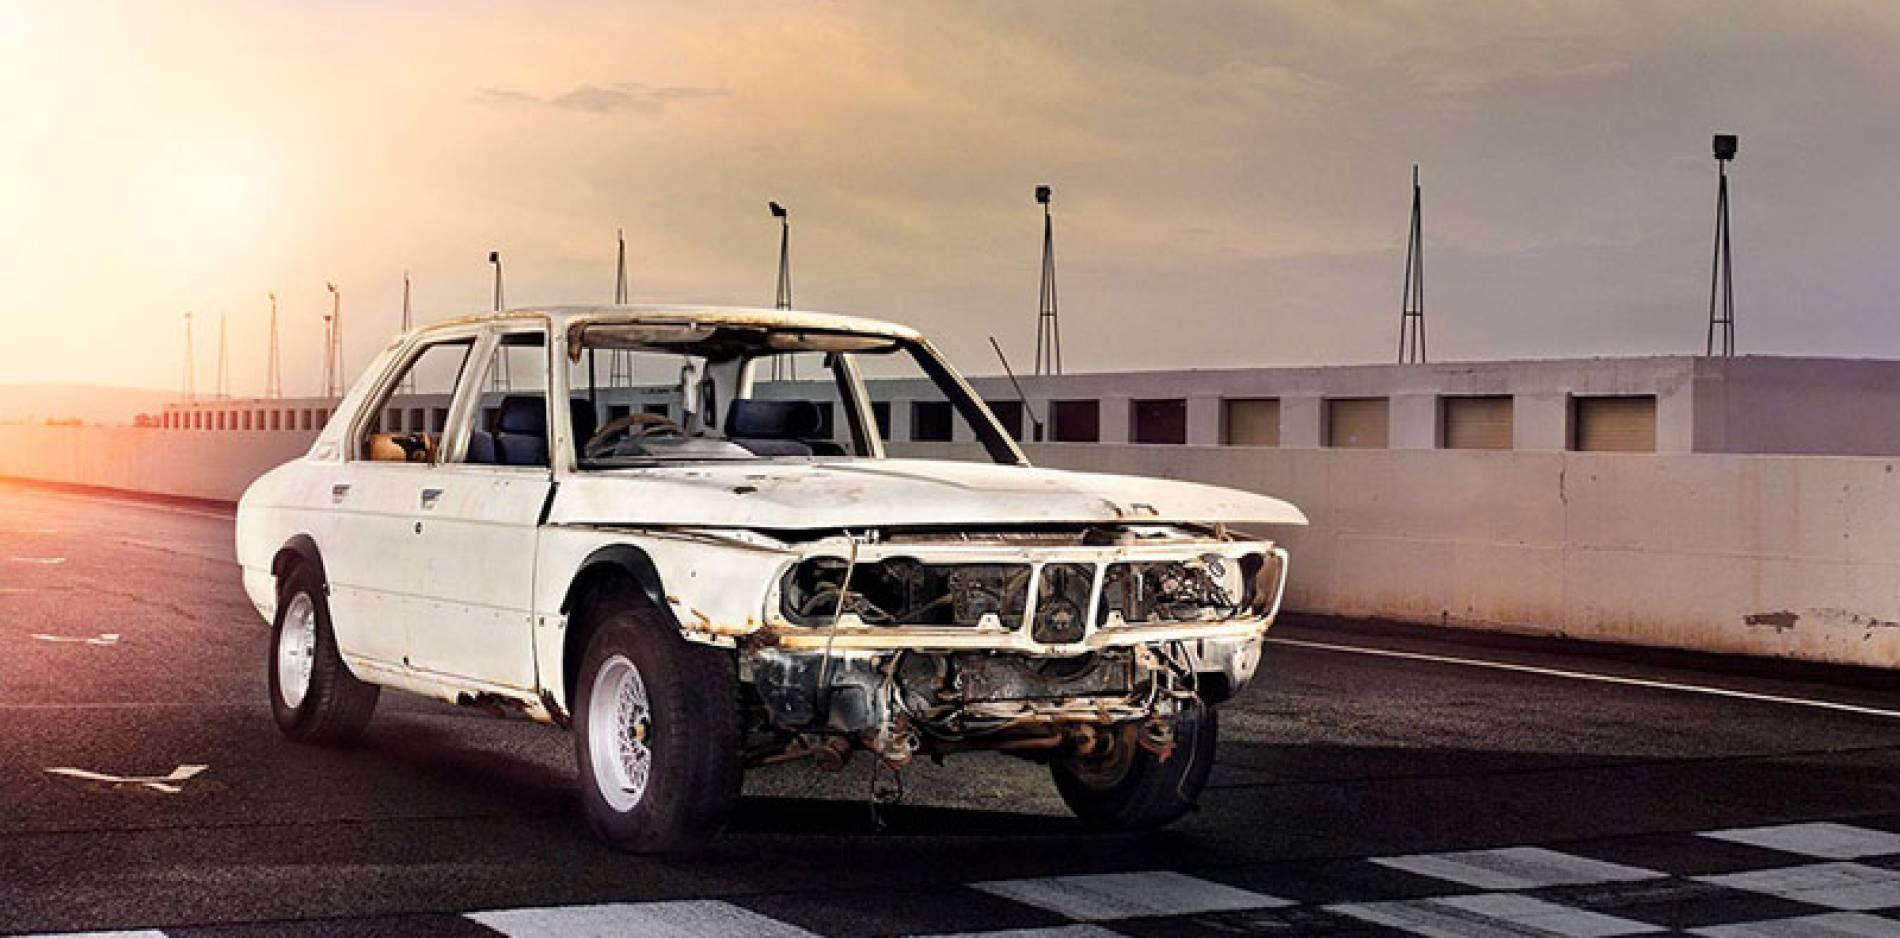 La peculiar vuelta a la vida del precursor del BMW M5